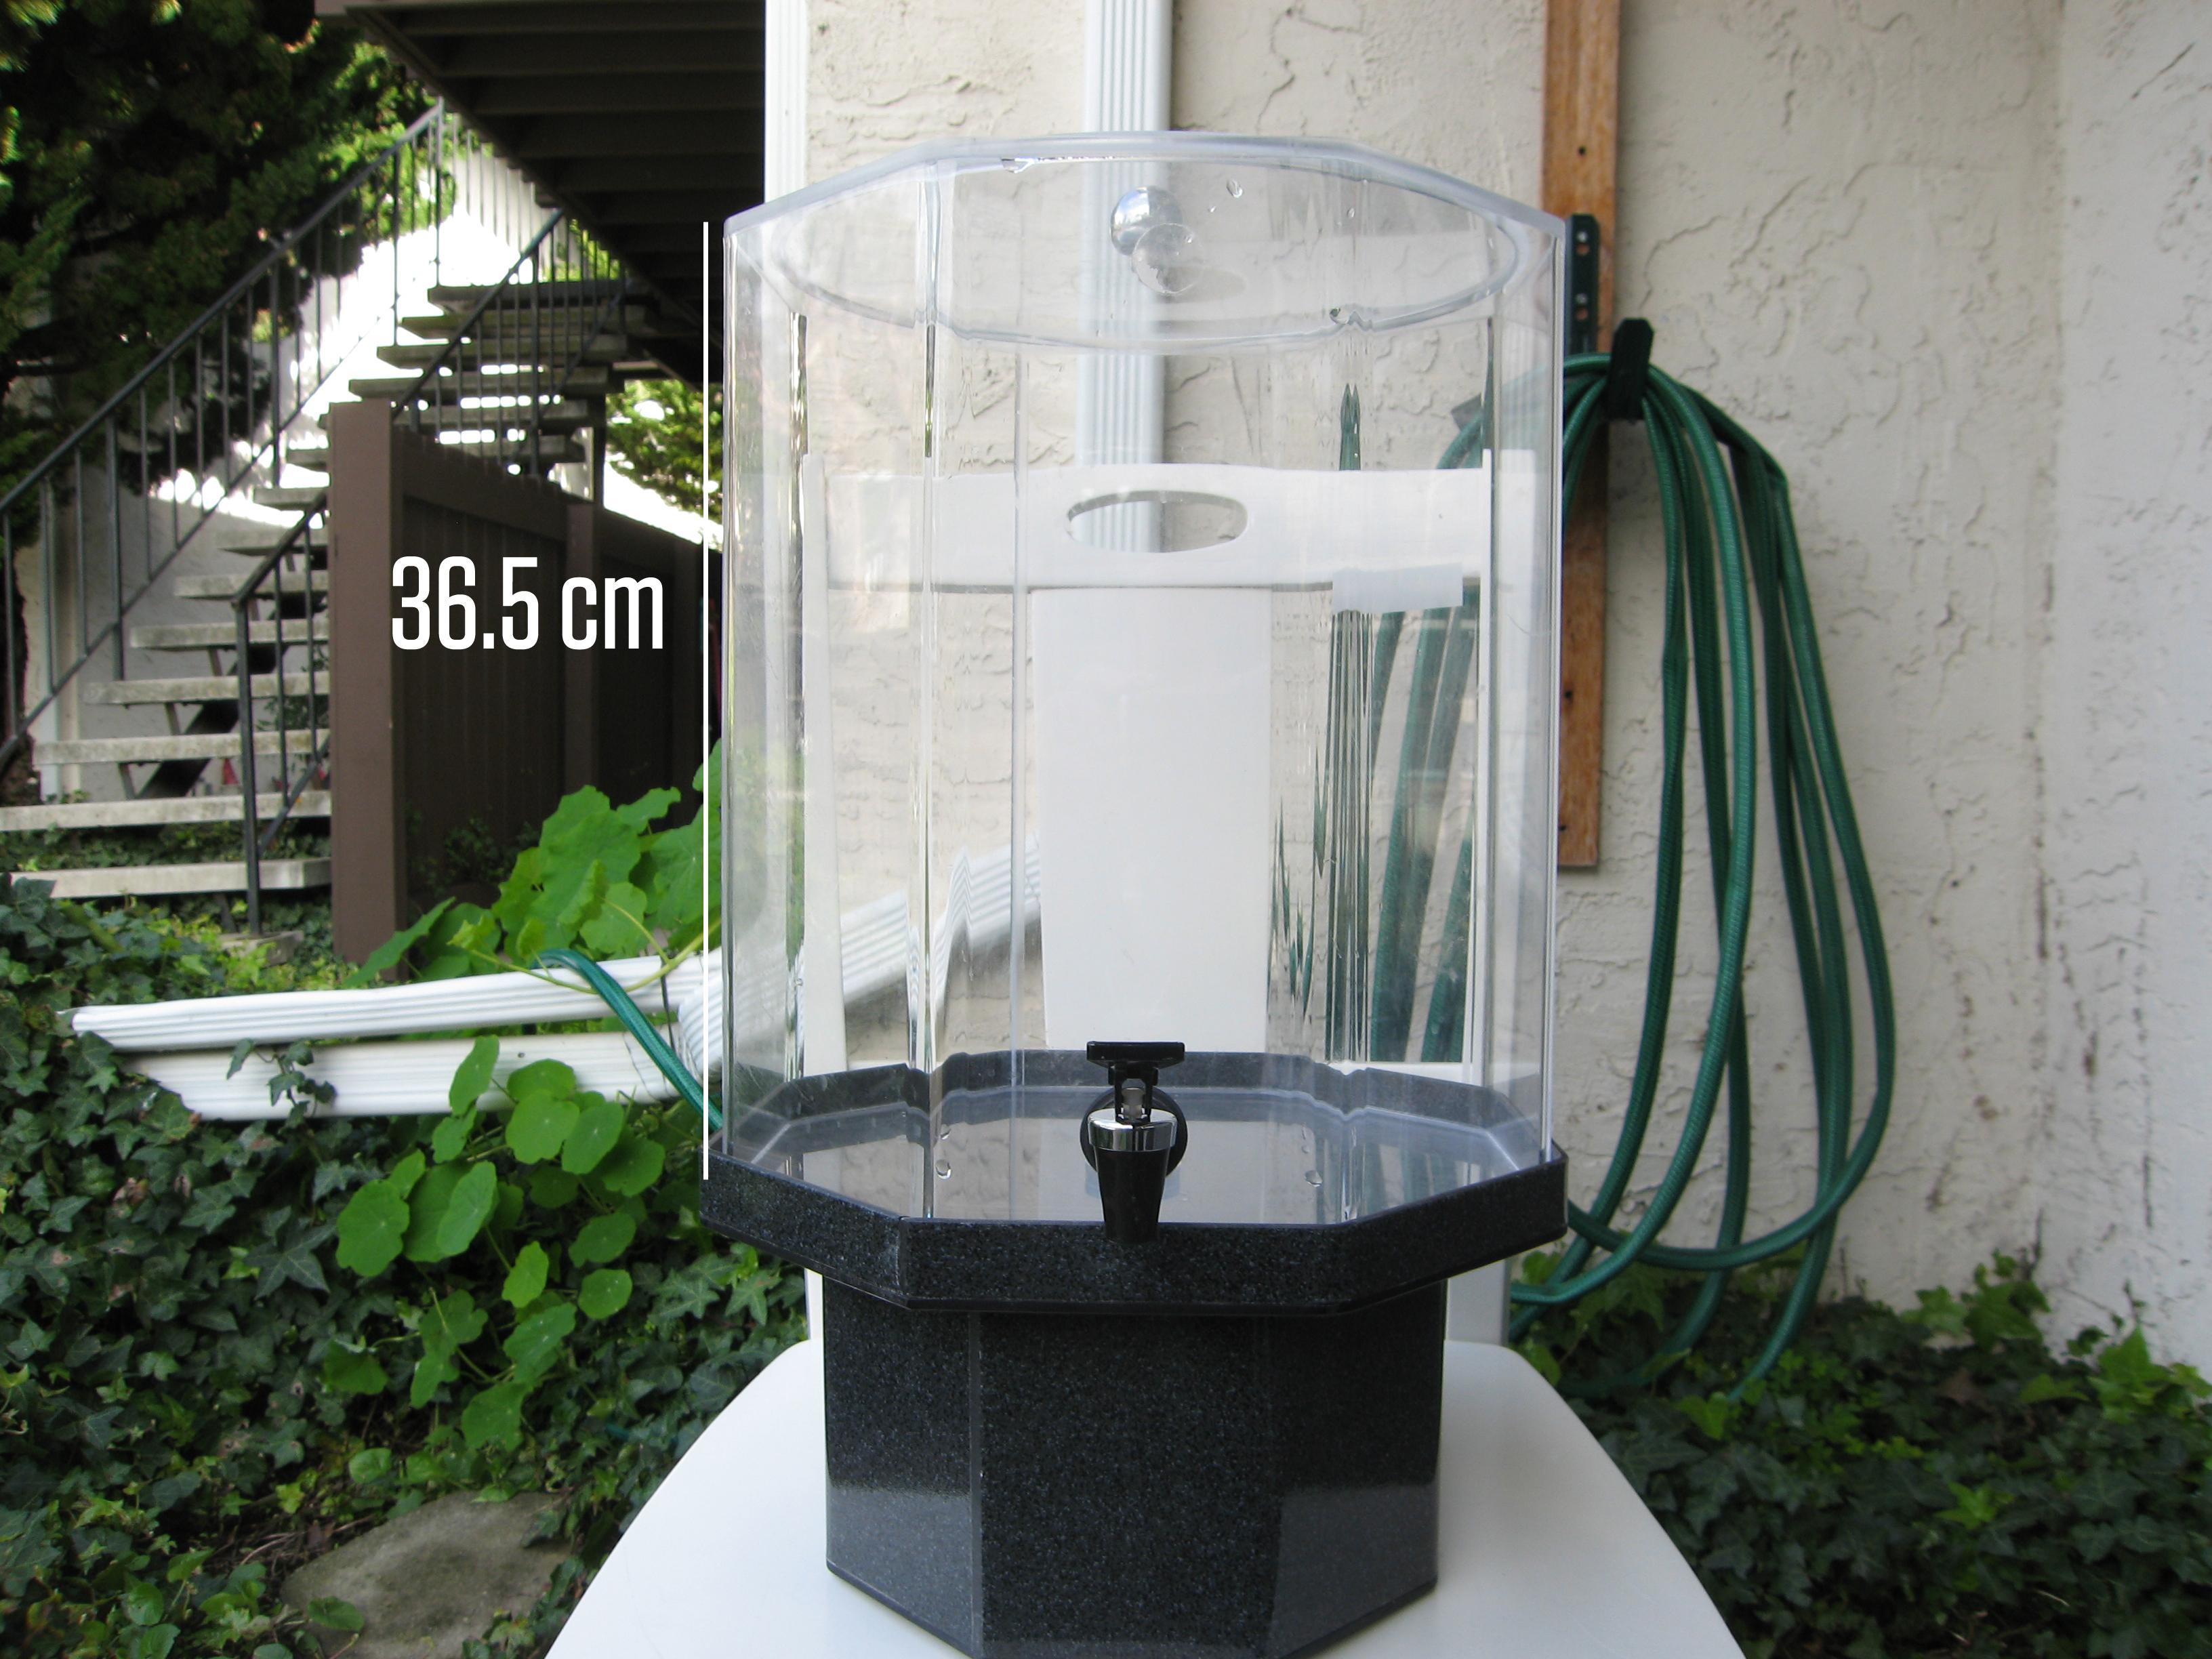 Fish tank volume calculator cm - Act Two